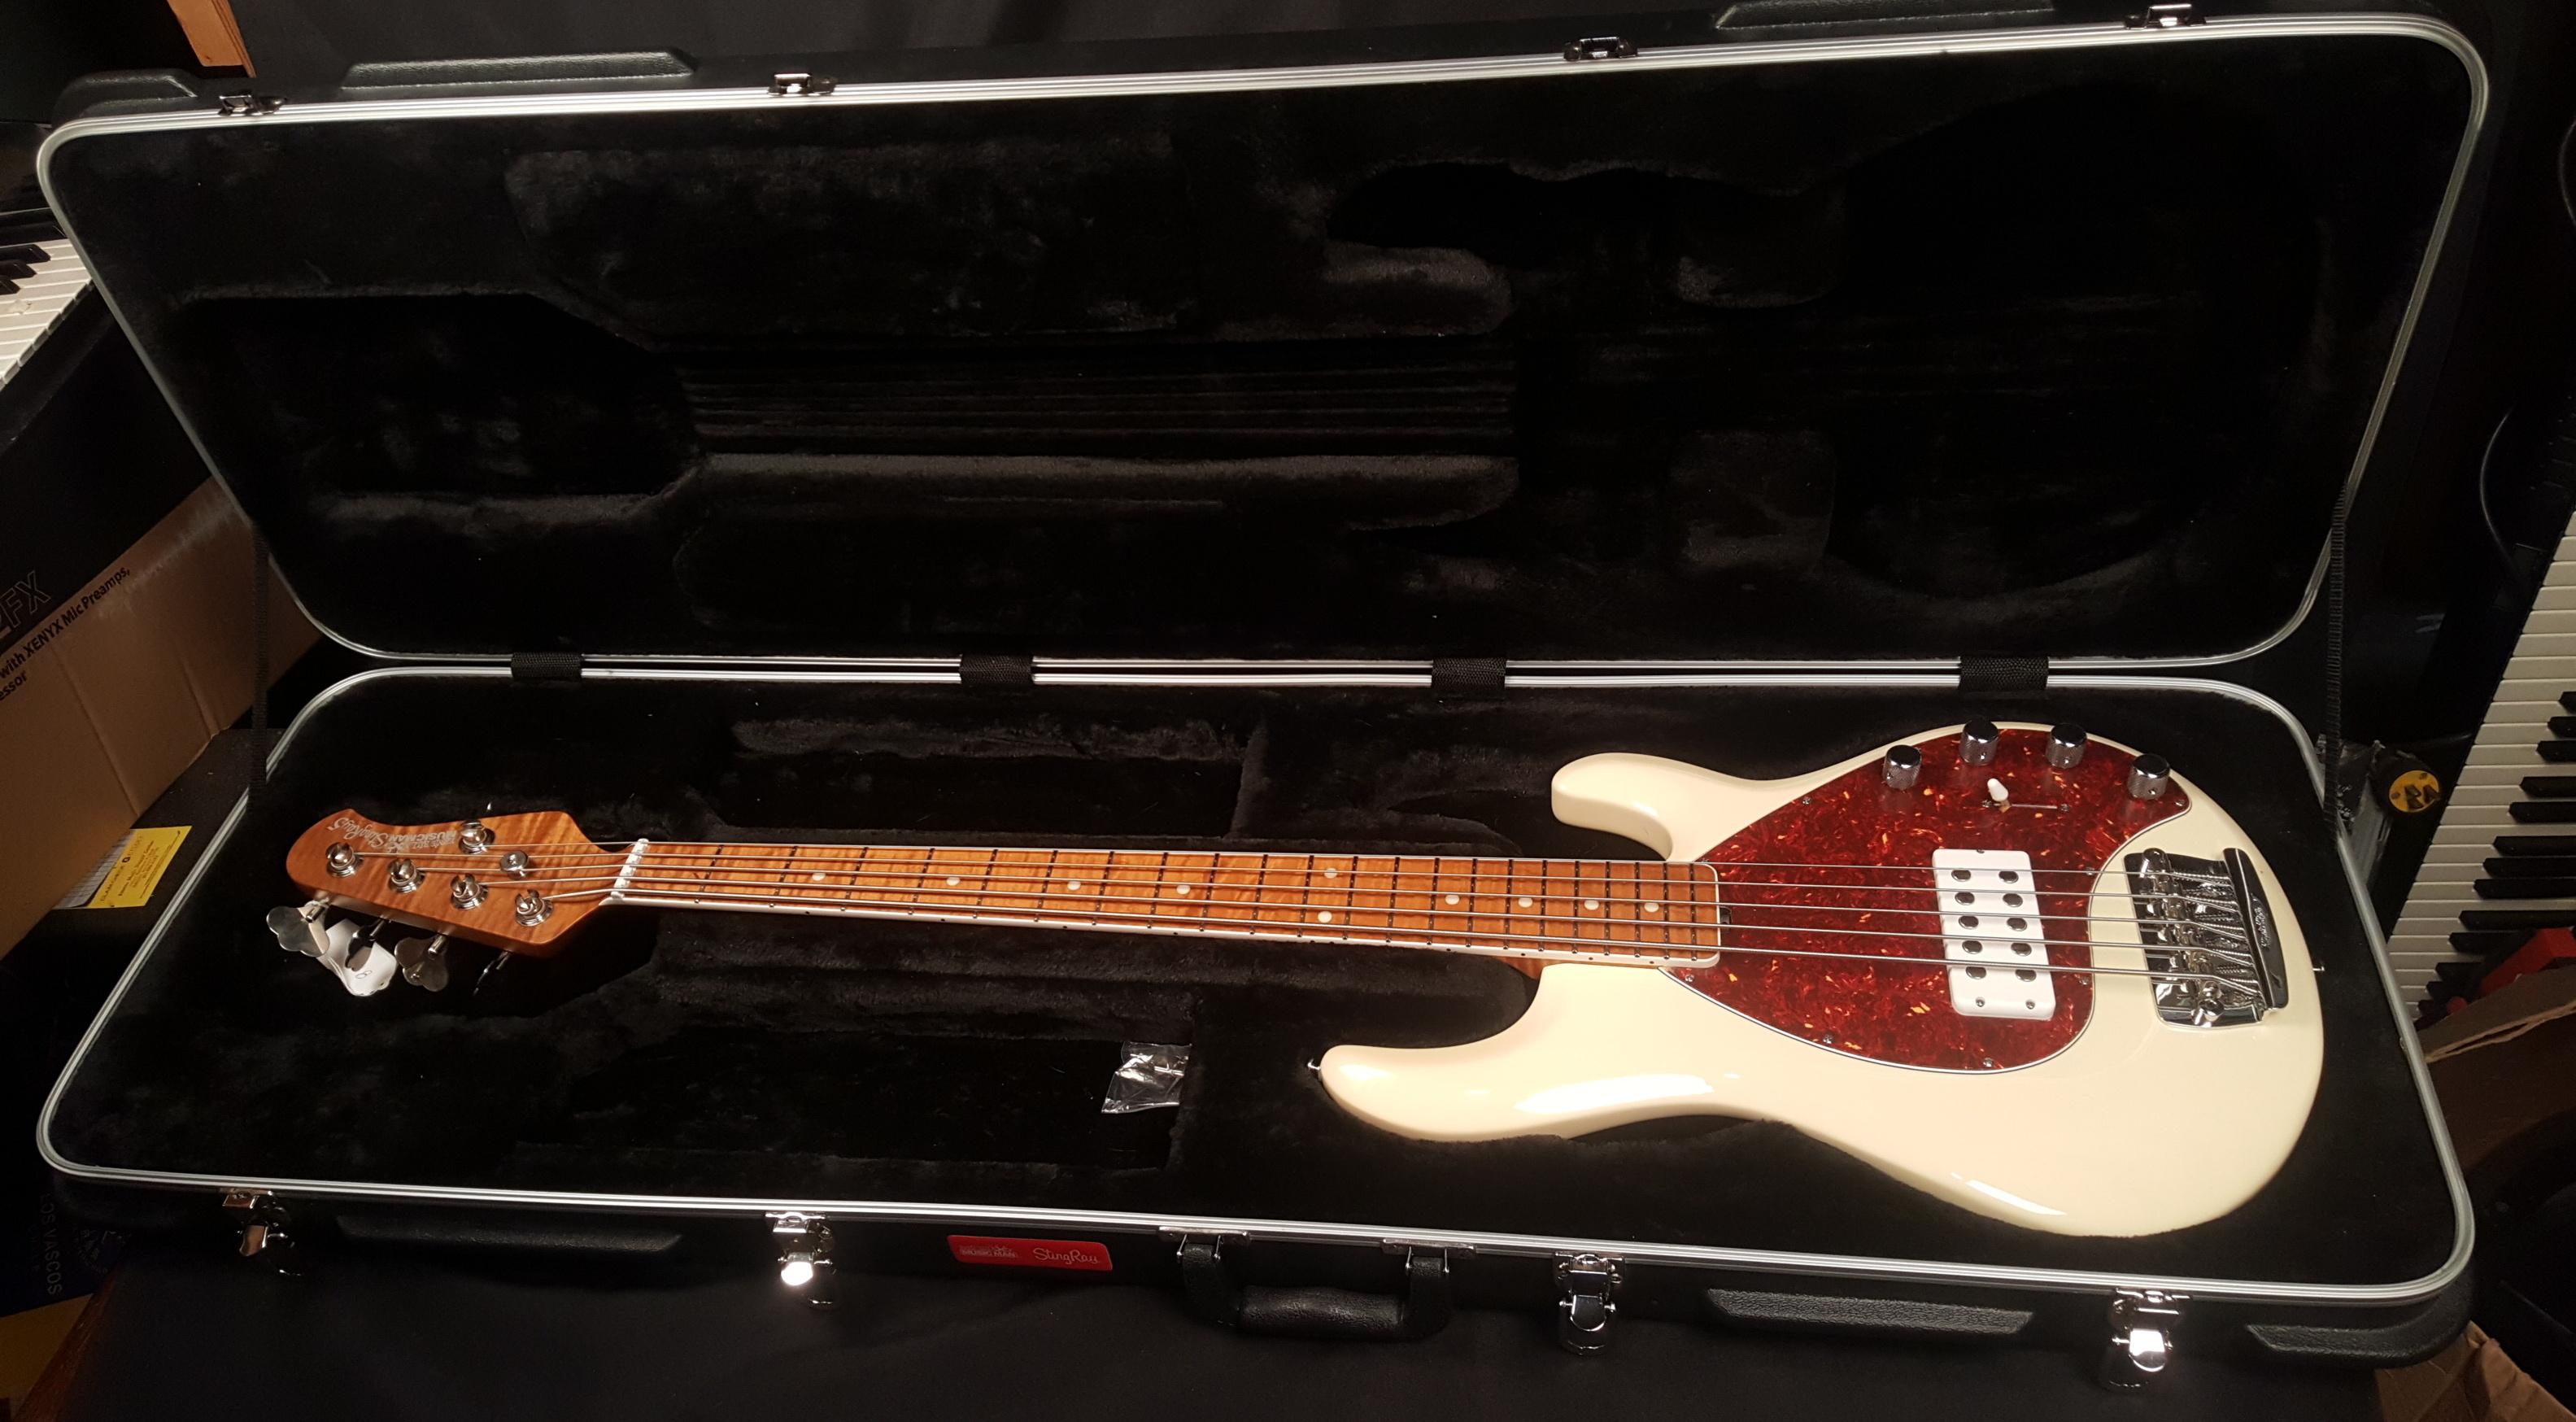 ERNIE BALL MUSIC MAN StingRay5 30th Anniversary Bass W/HSC - TRANS BUTTERCREAM!